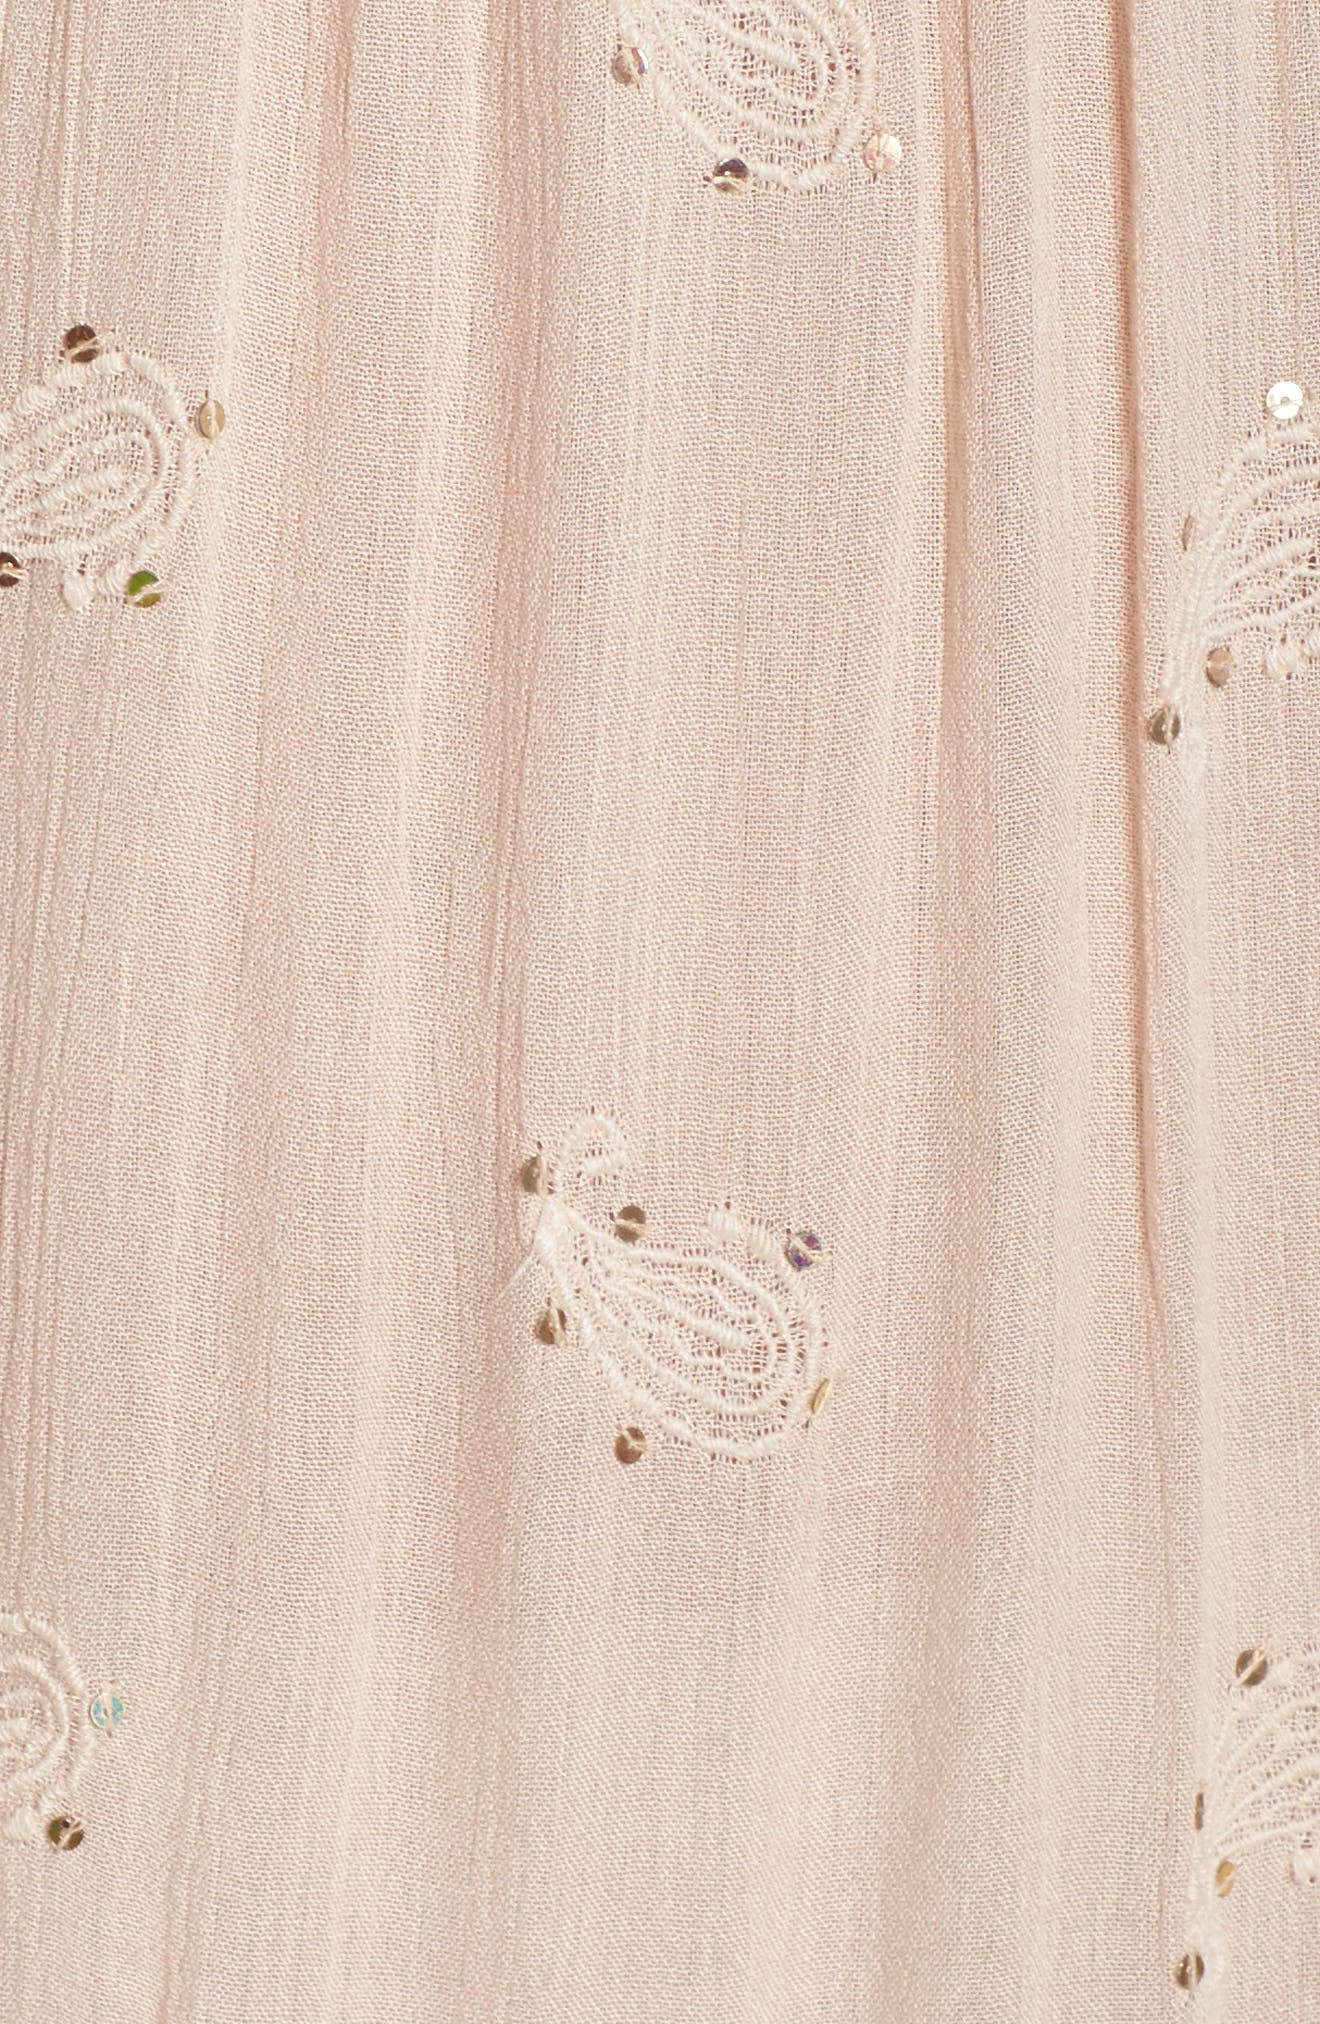 Mercer Cover-Up Maxi Dress,                             Alternate thumbnail 5, color,                             650